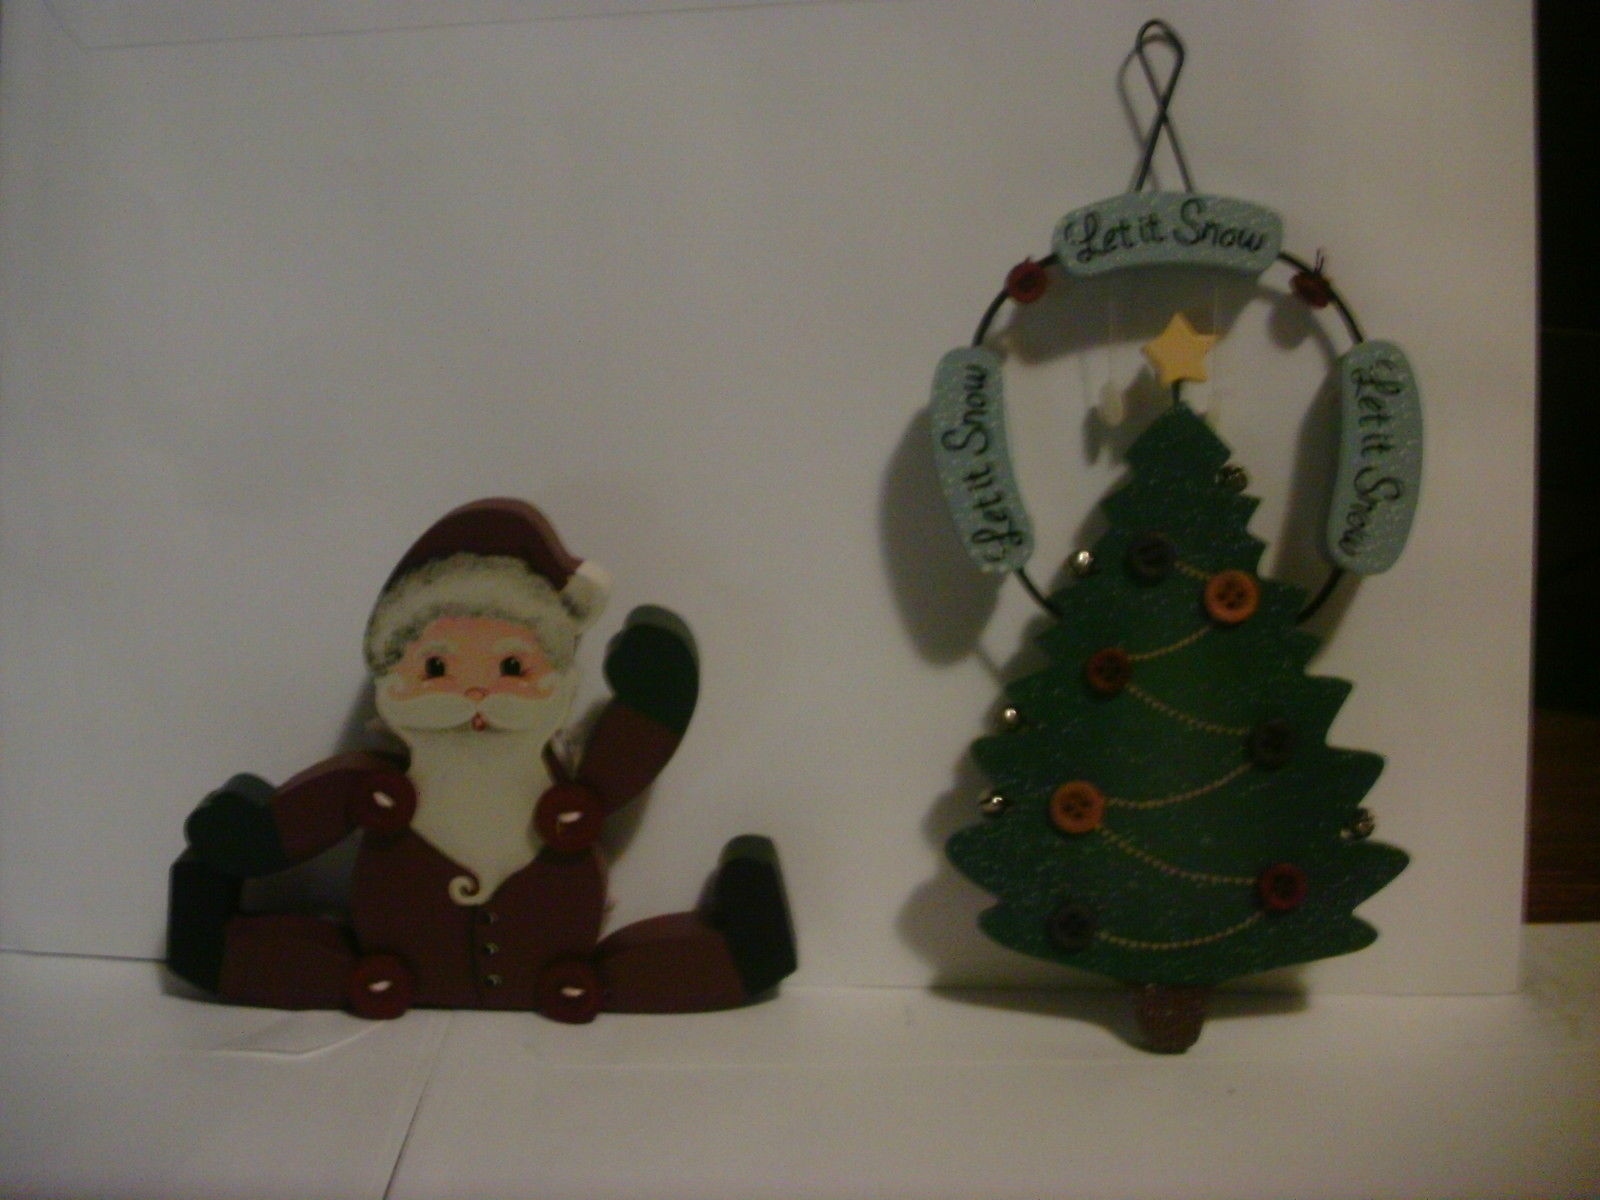 2 Wooden Tender Heart Treasures Ltd Decorations Christmas Tree & Santa